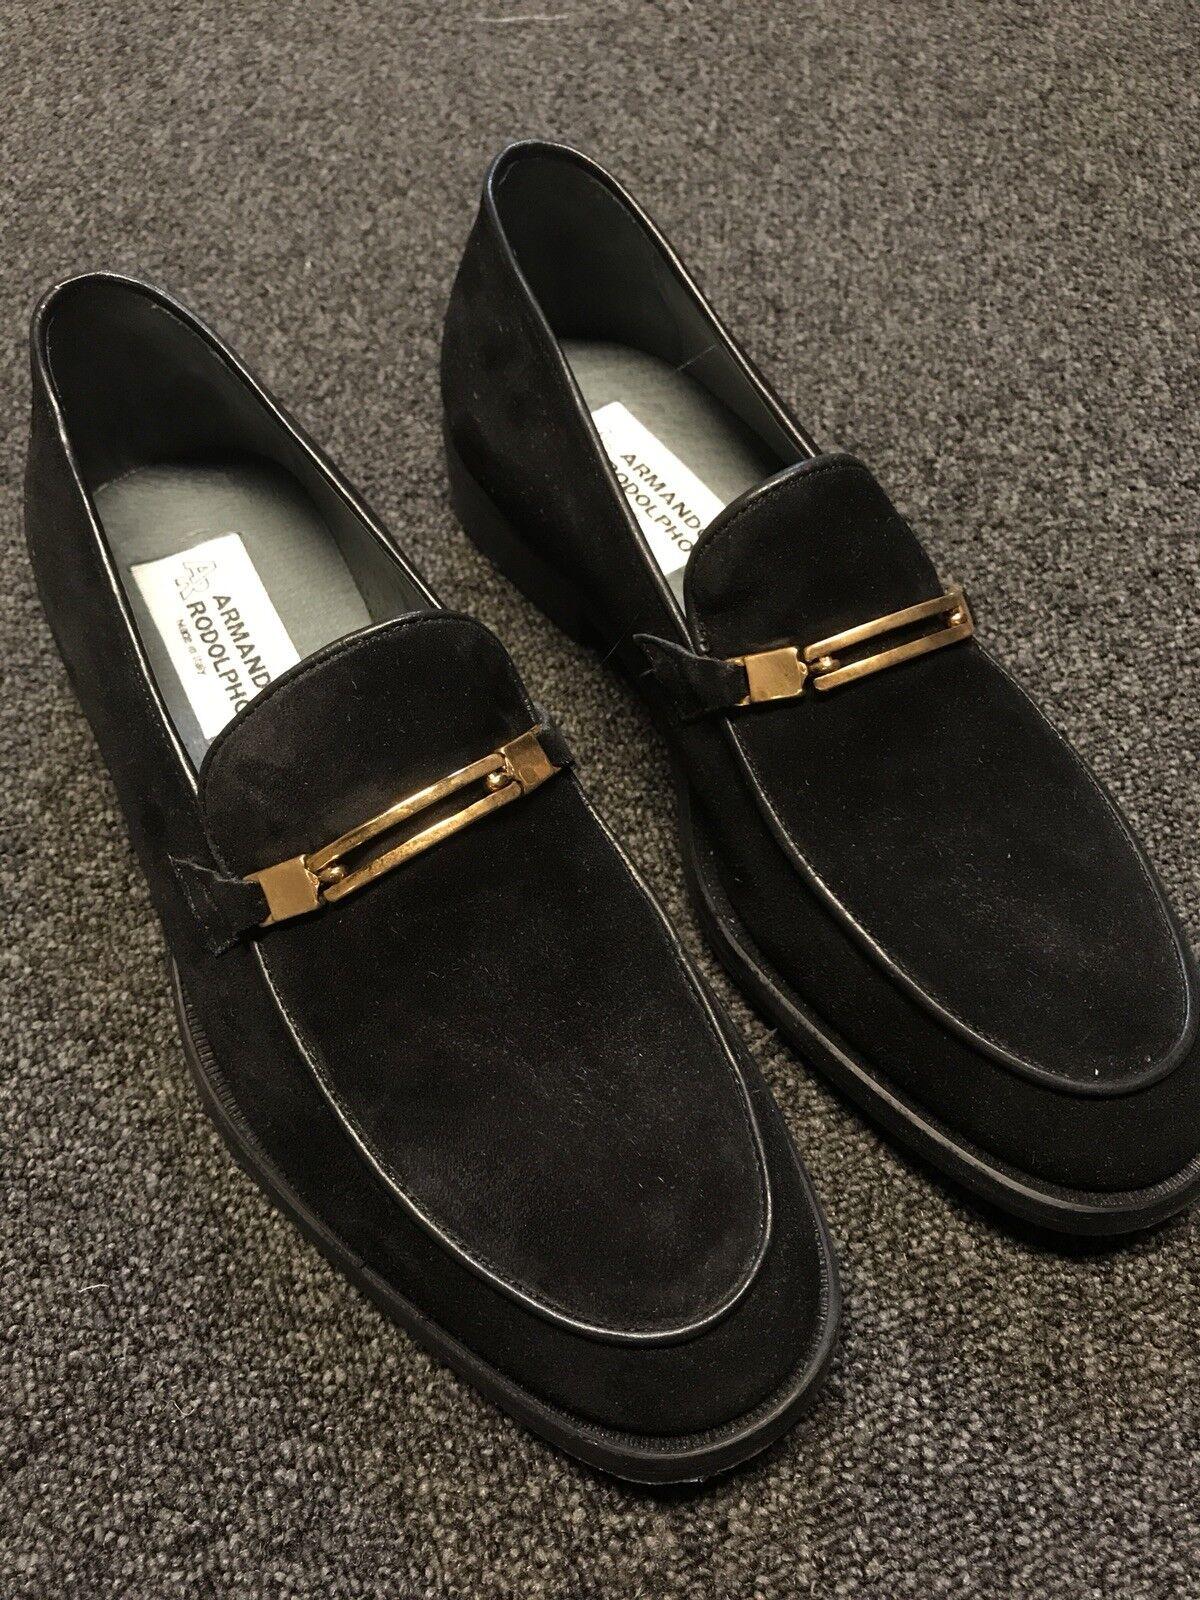 Arhommedo roldolpho Homme en daim noir Mors de Cheval Mocassins taille US 9 EU 42 Chaussures